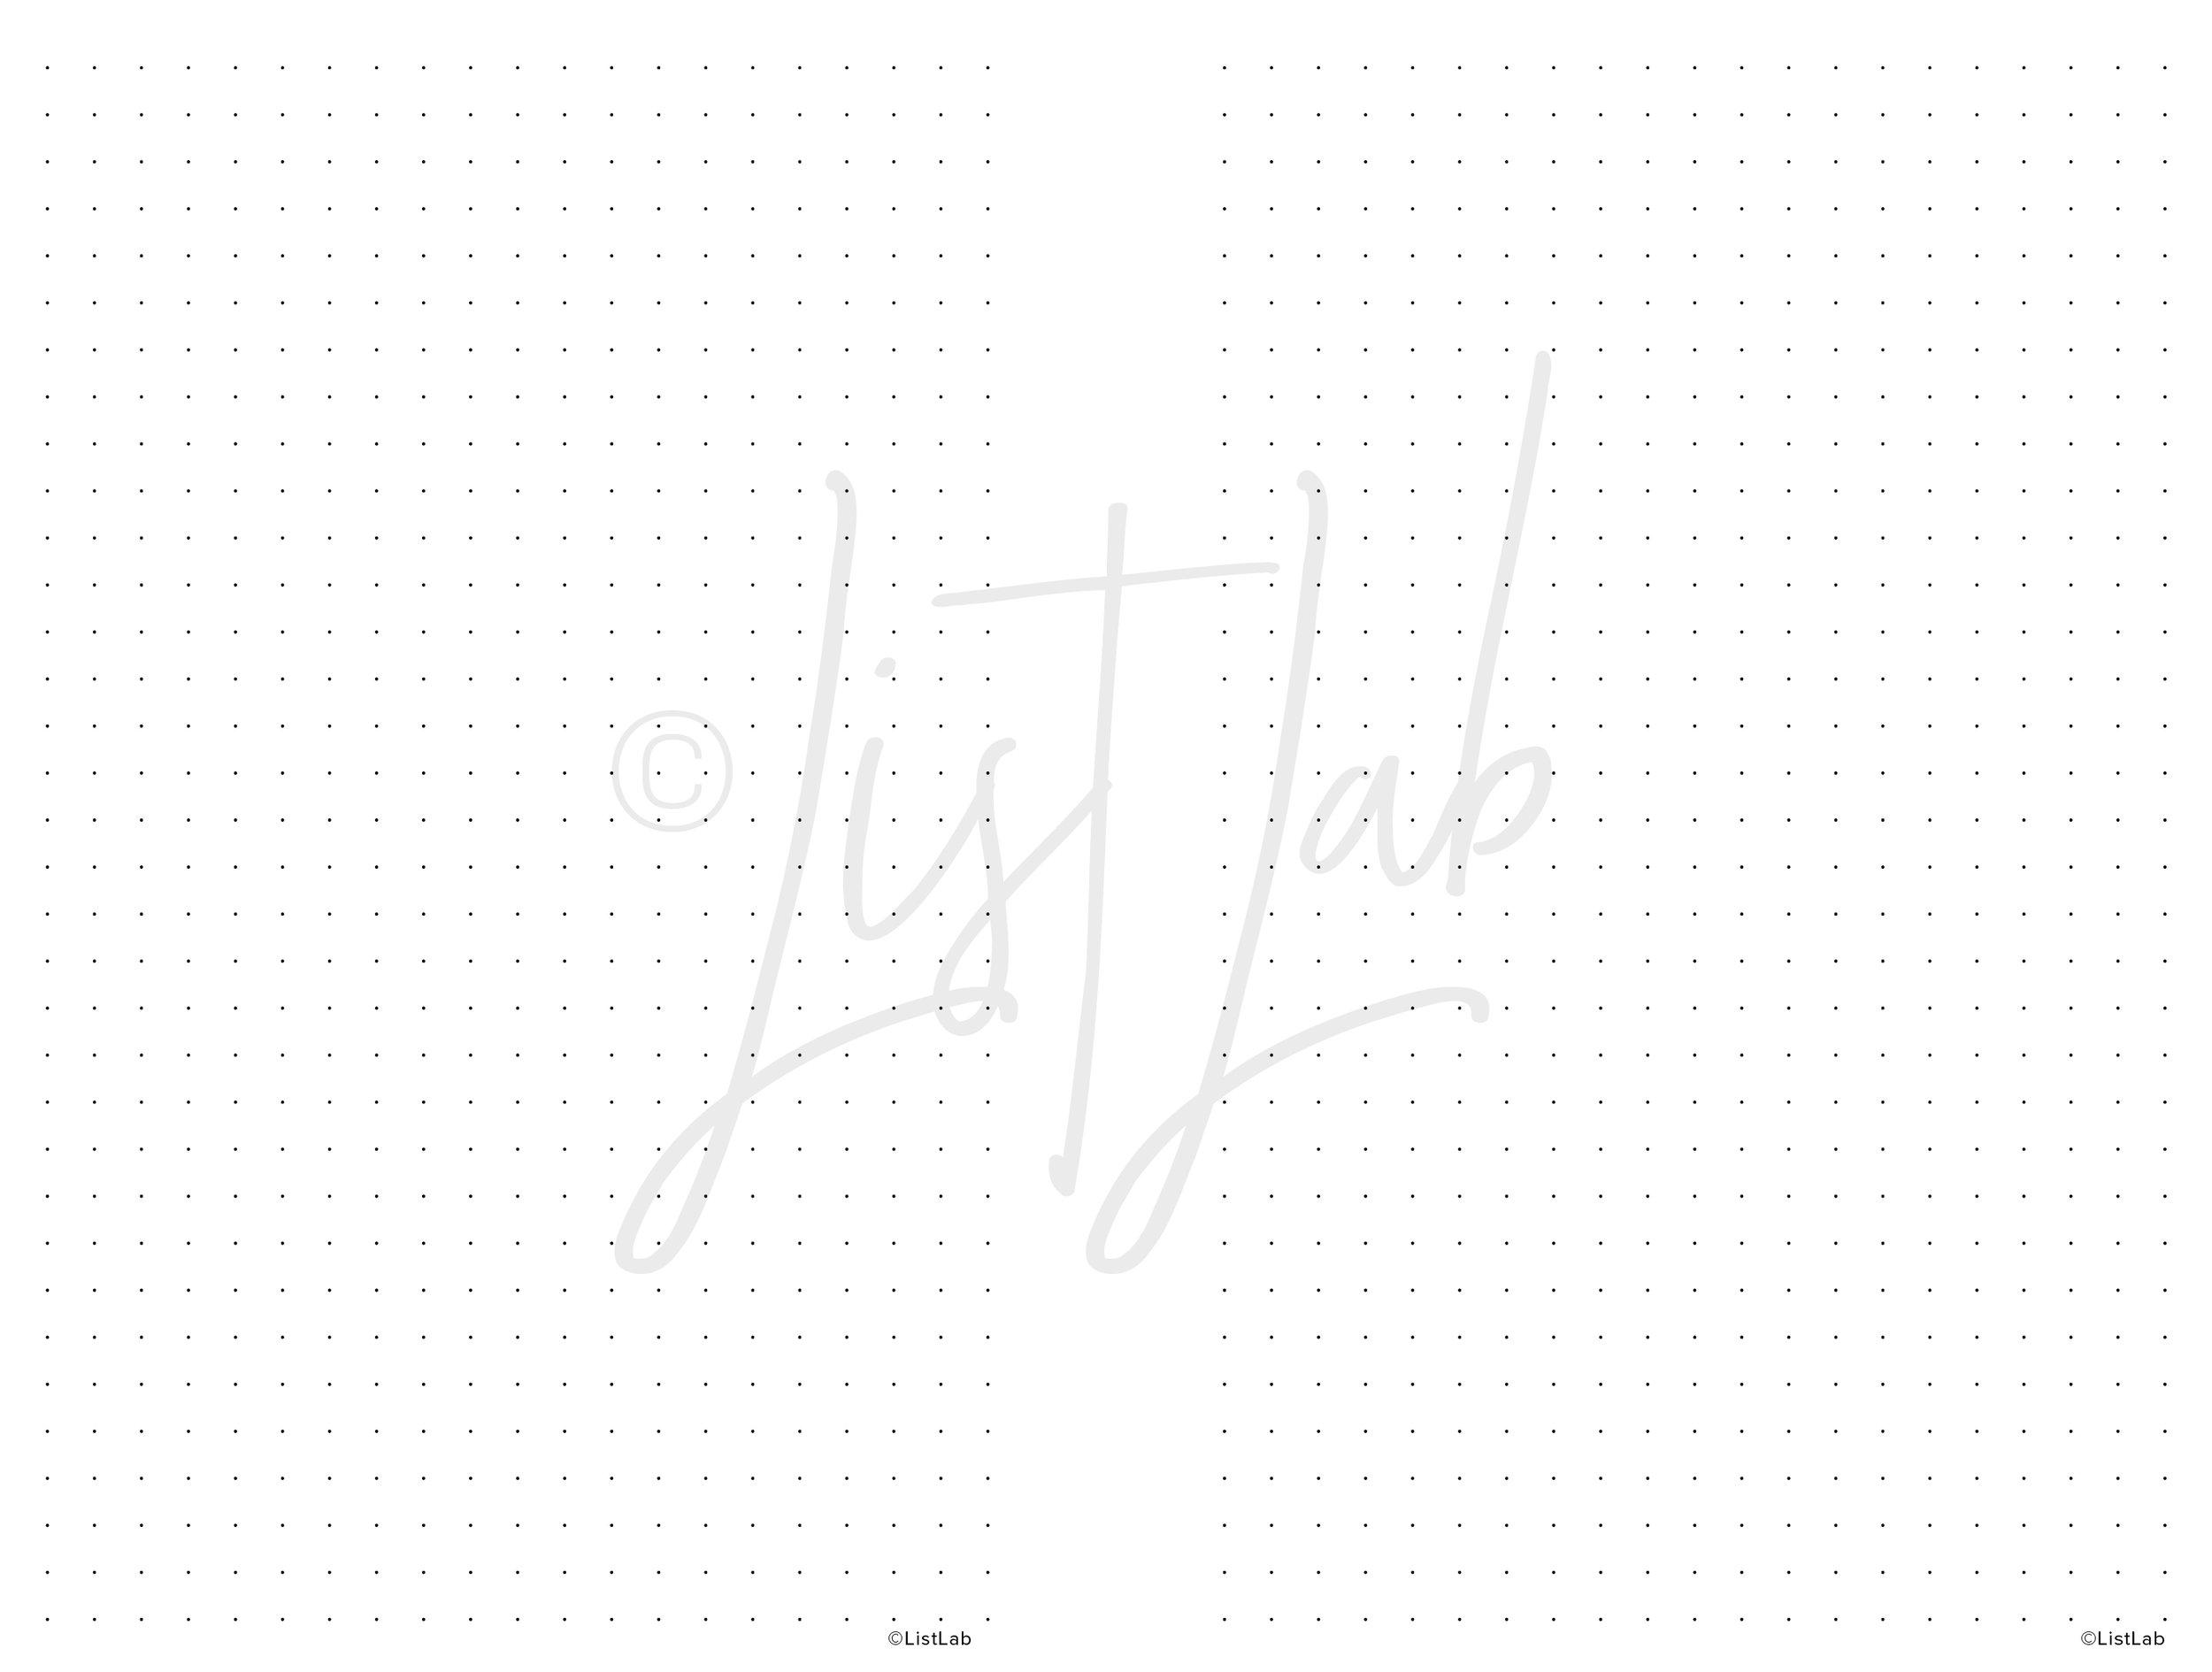 spark_disc_mini_undated-21.jpg